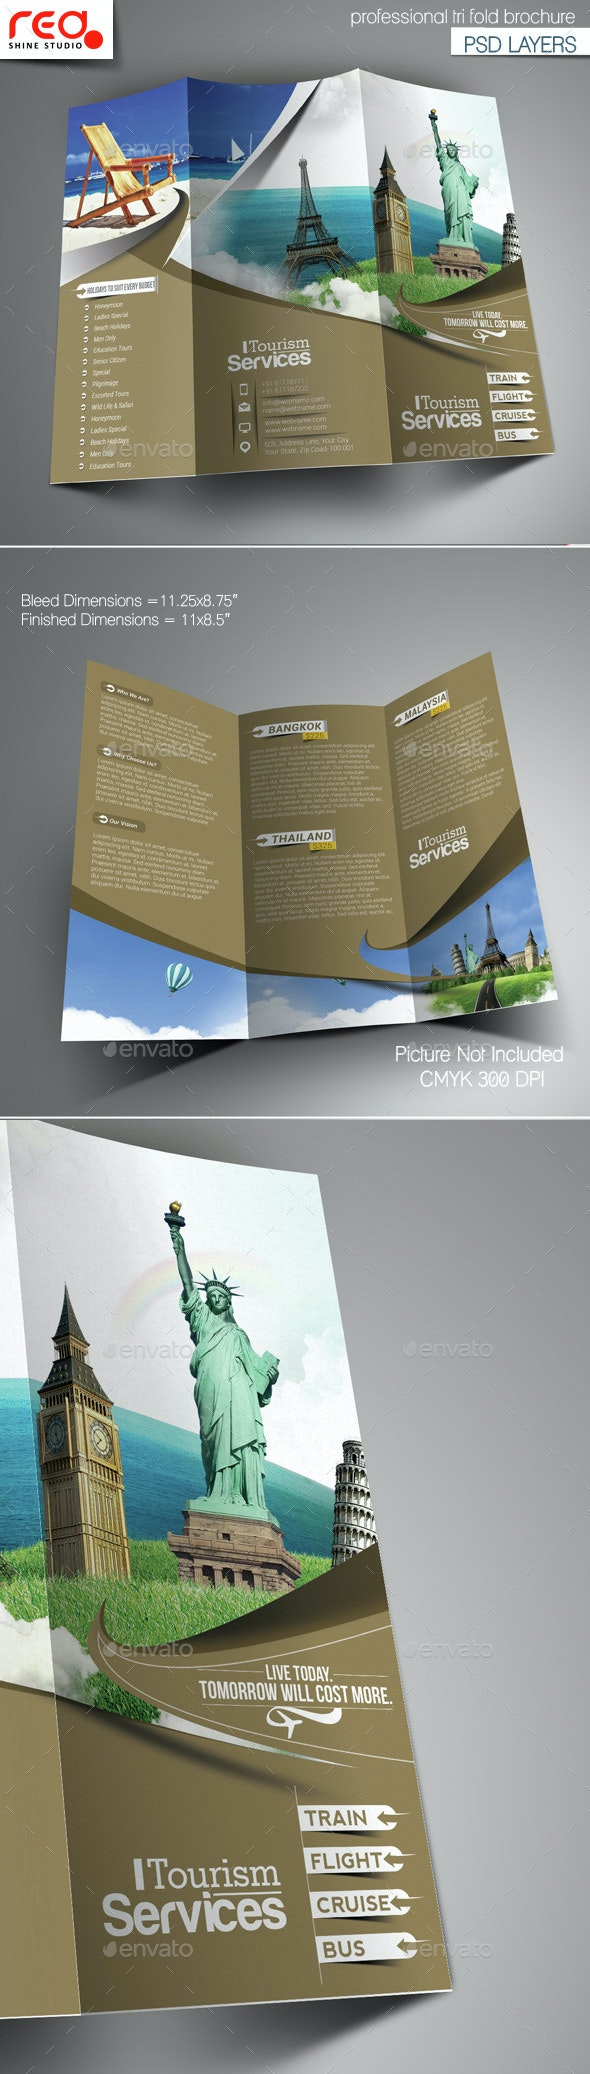 Tourism Service Trifold Brochure Template  - Corporate Brochures